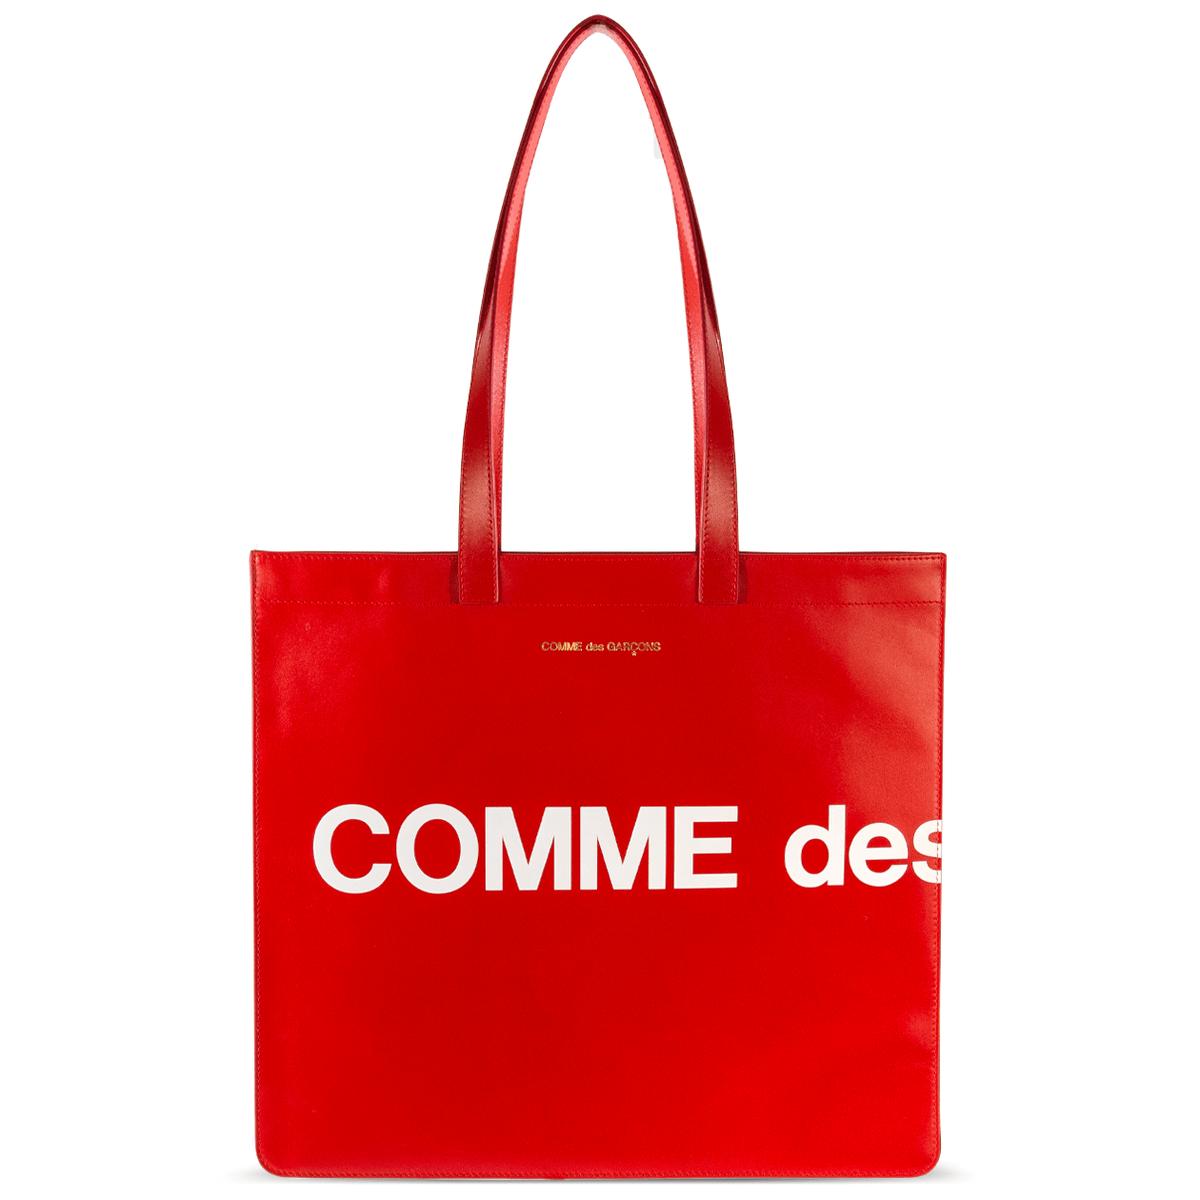 Huge Logo Leather Tote Bag Red.